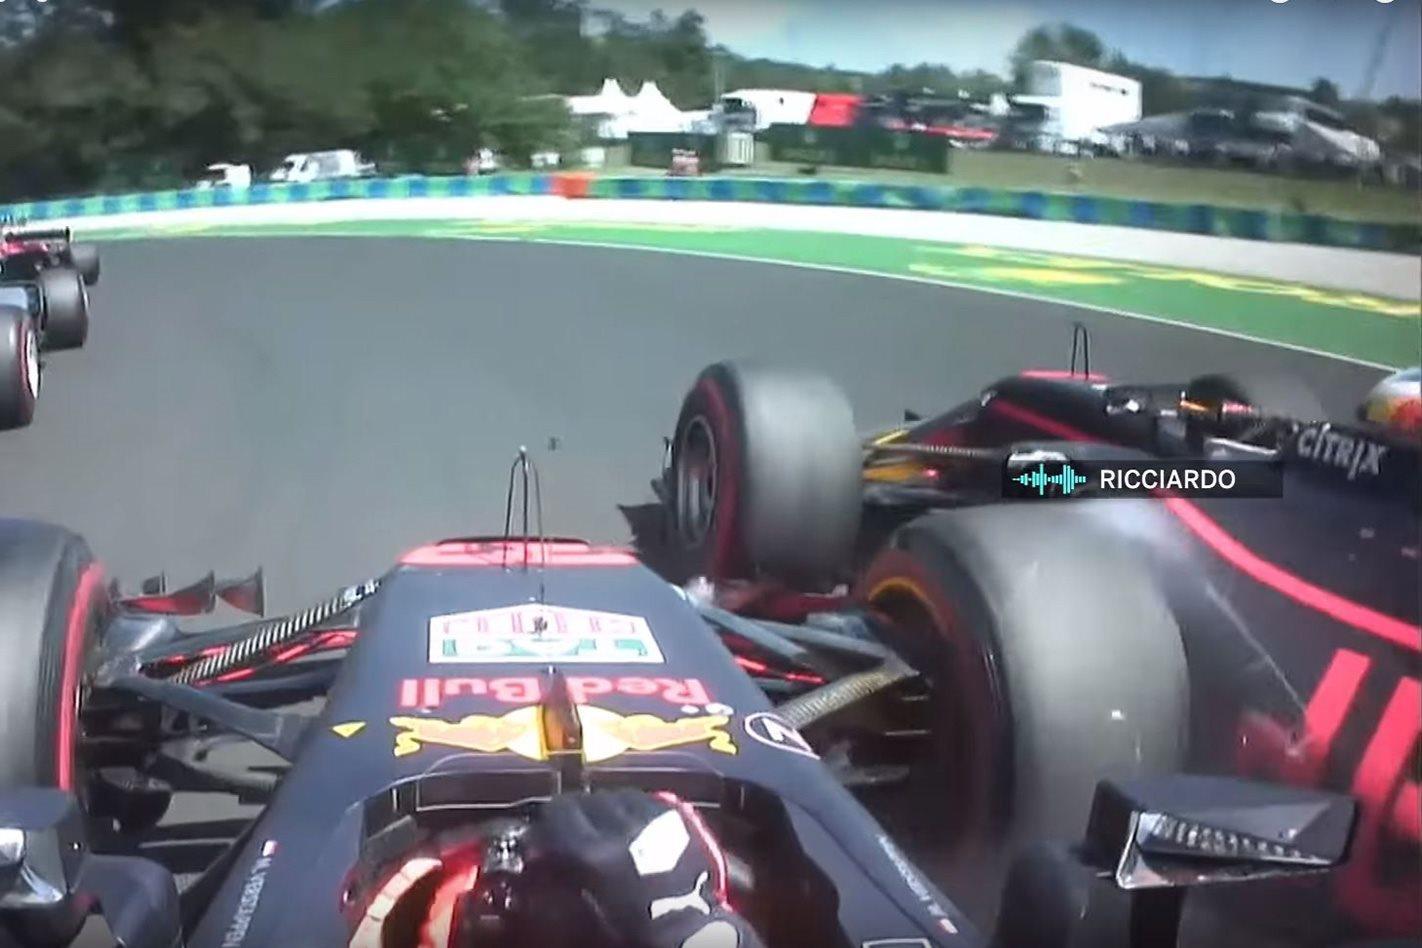 Verstappen versus Ricciardo